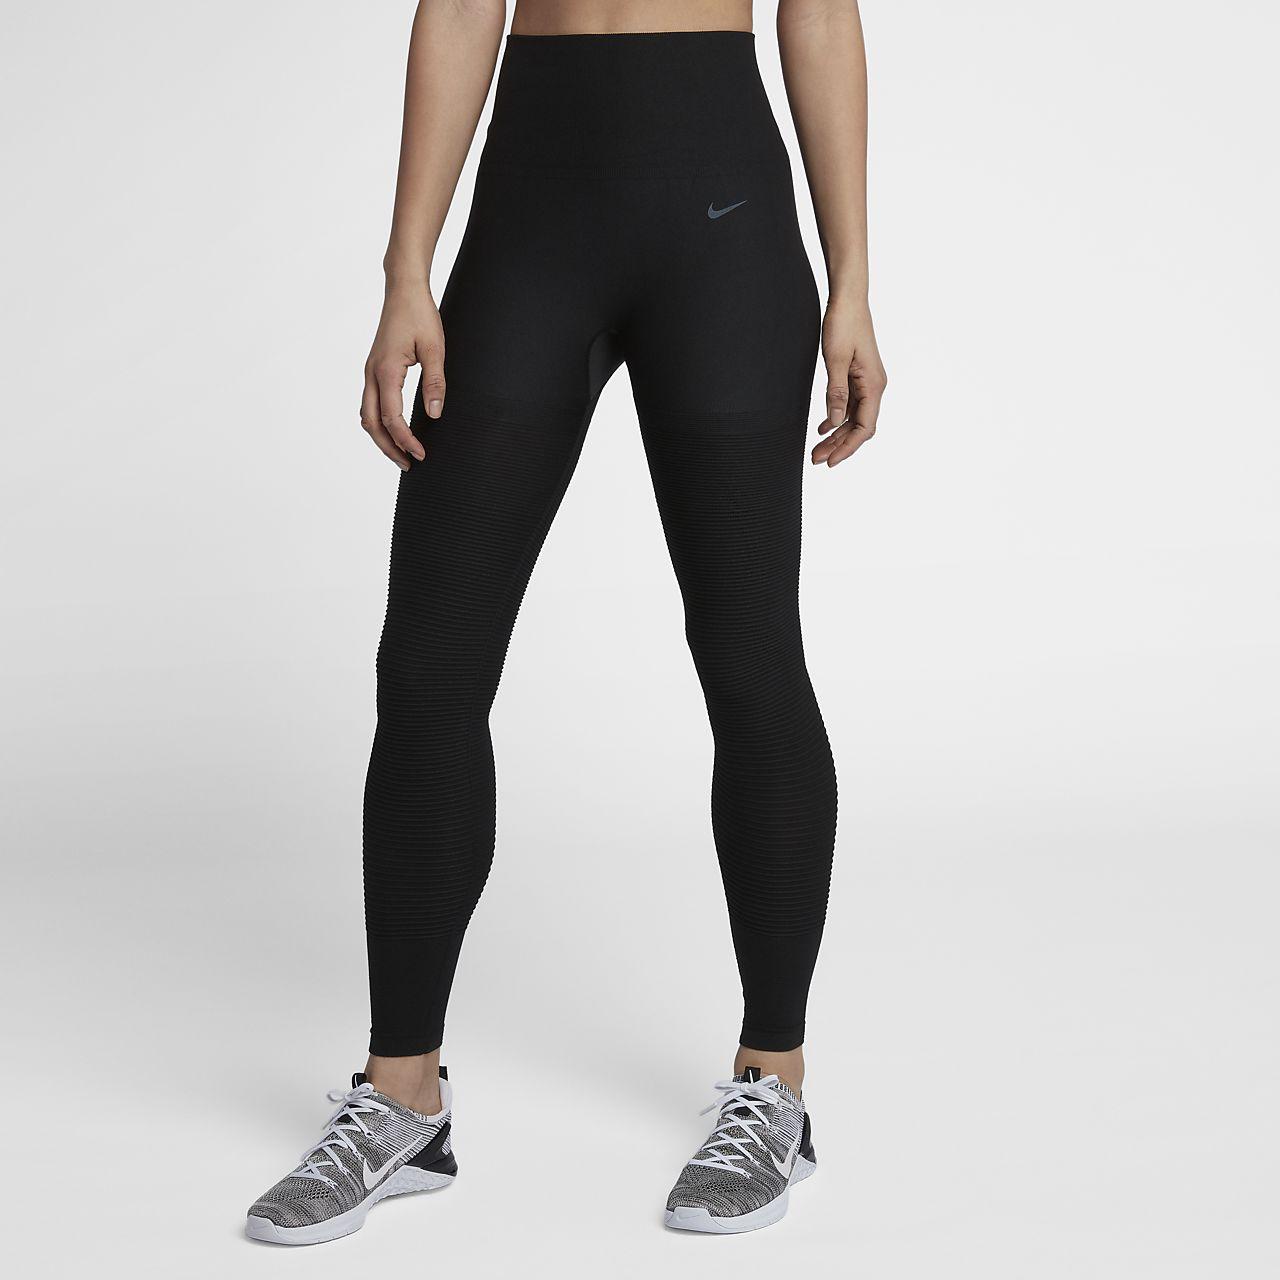 ... Nike Seamless Women's High-Waist Studio Tights